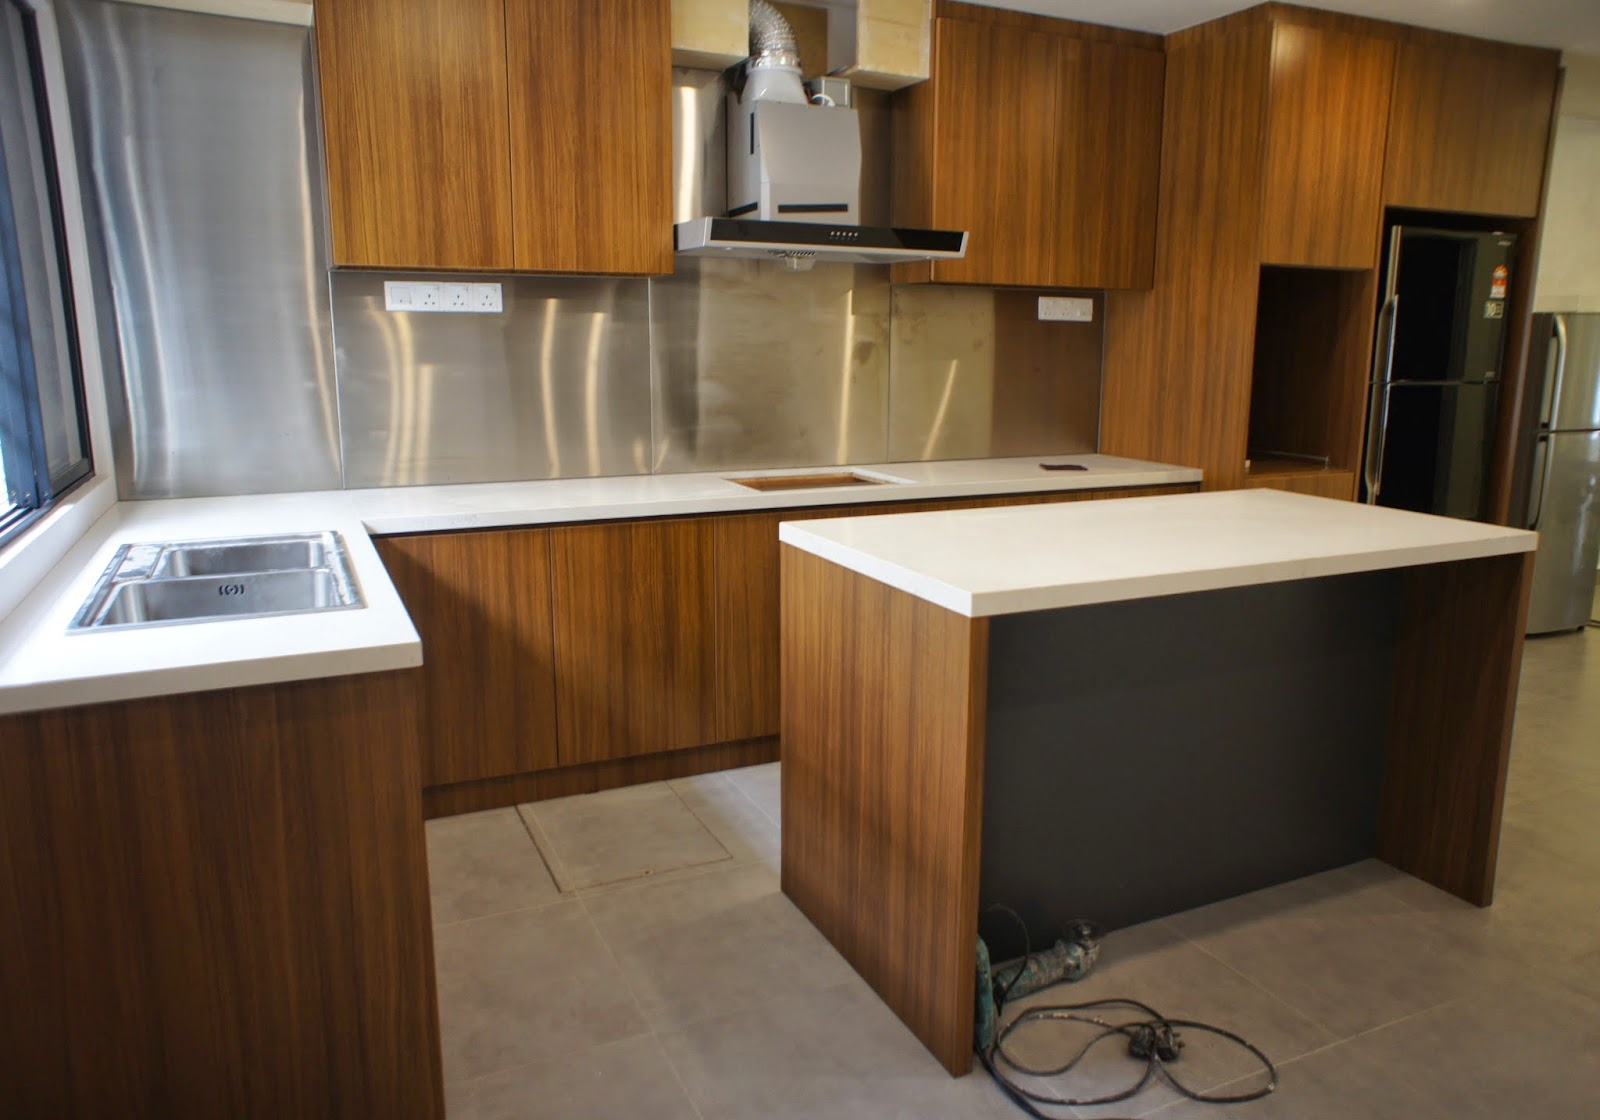 fukusu: Kitchen Cabinet in awesome Formica Teak Allover ...